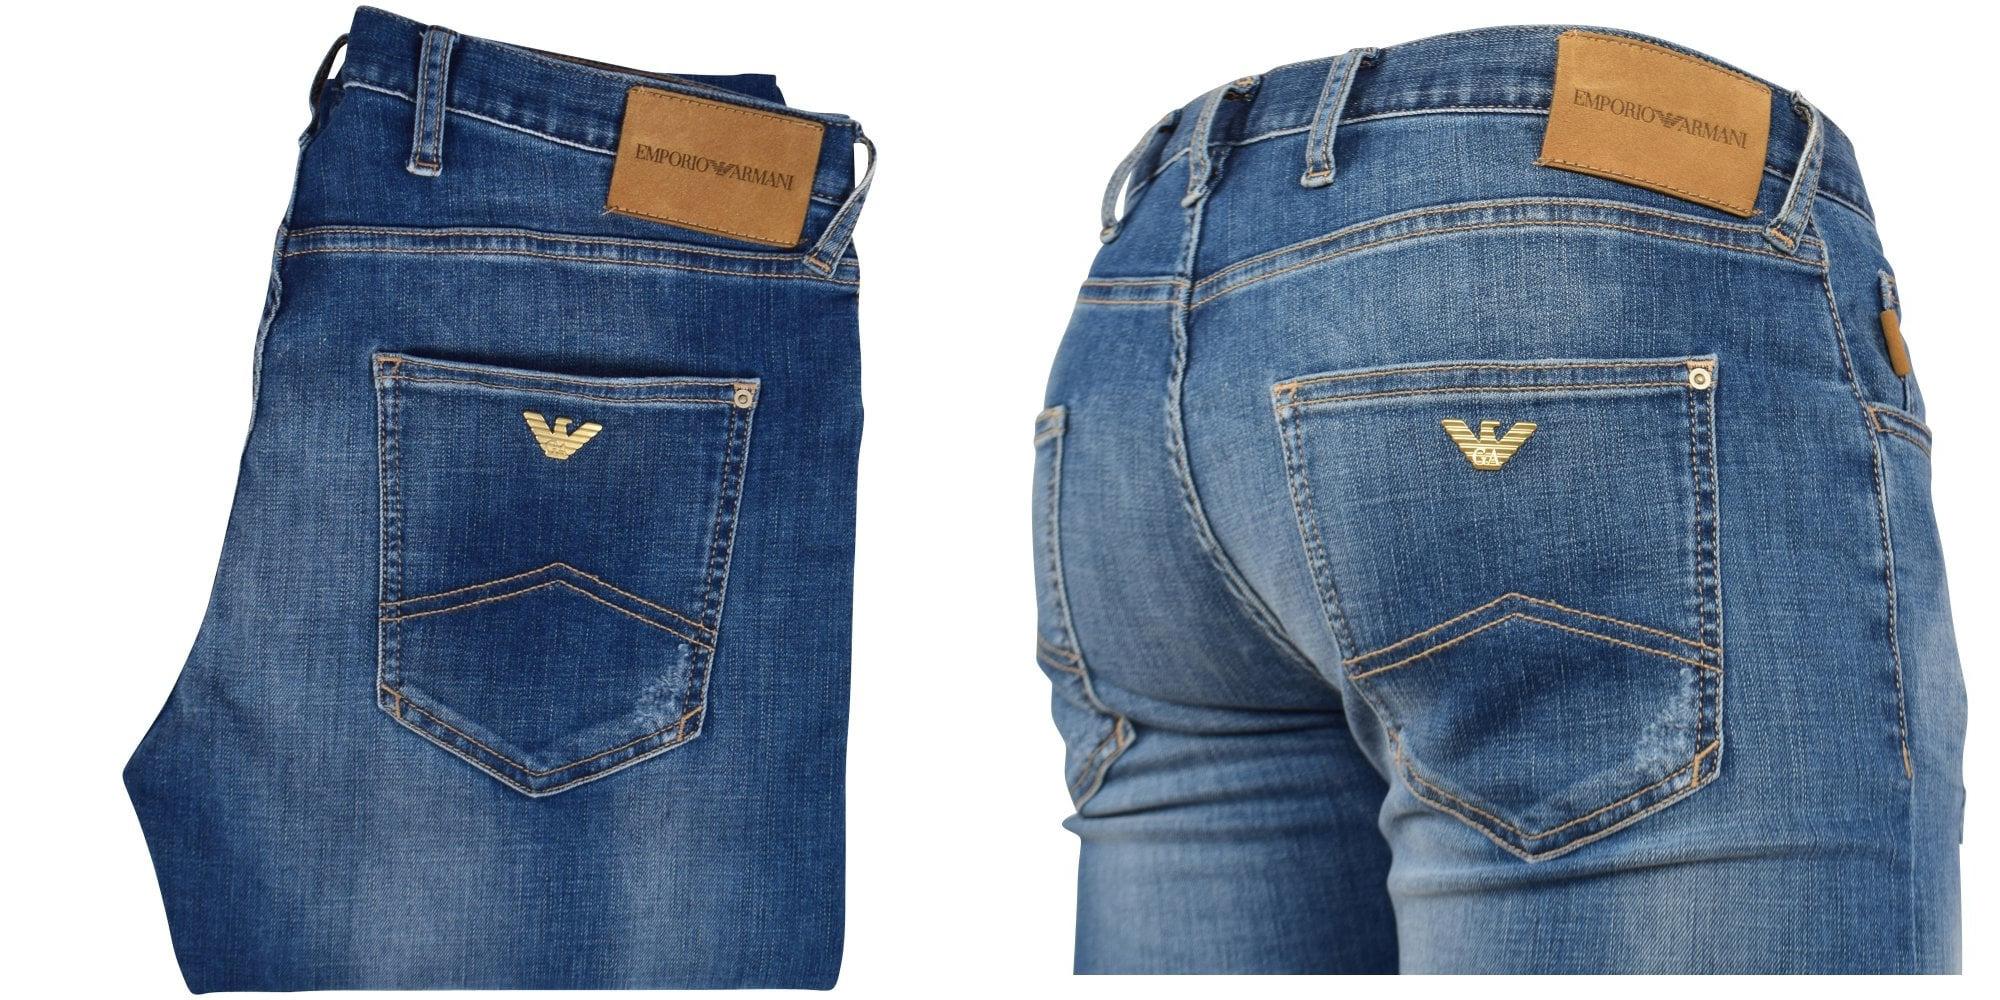 Image of Emporio Armani Jeans